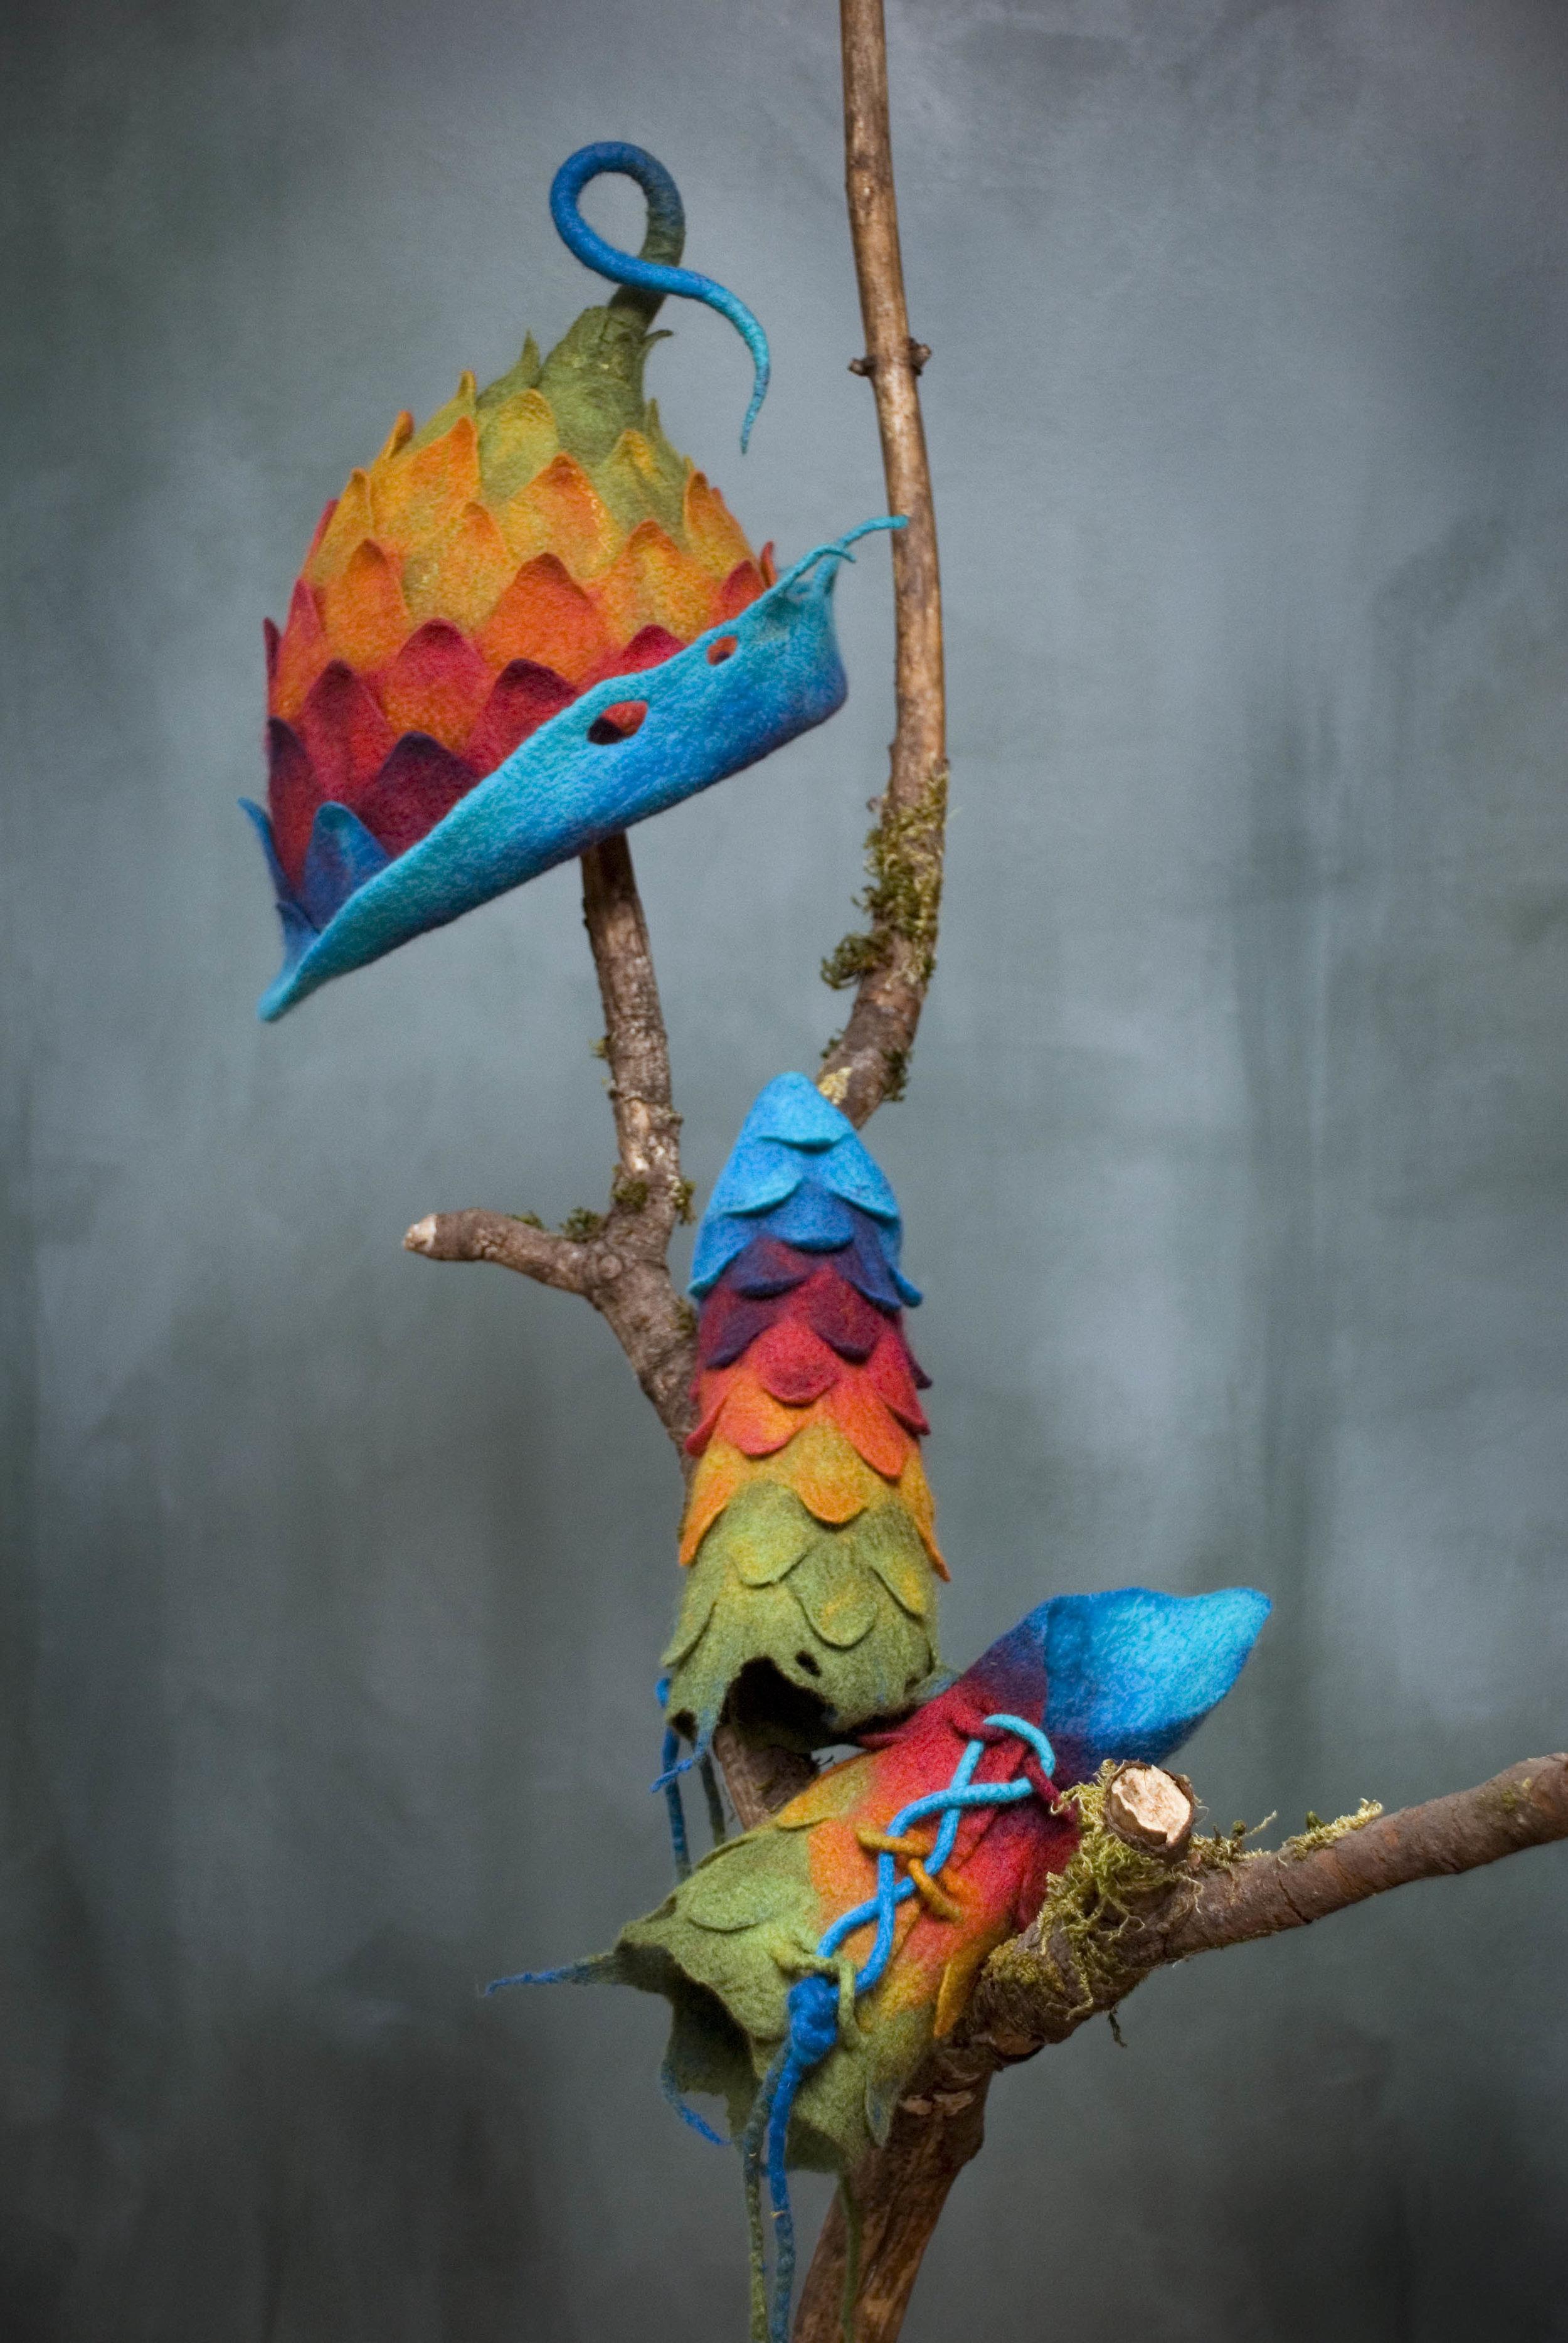 wren-rainbowdragon8.jpg